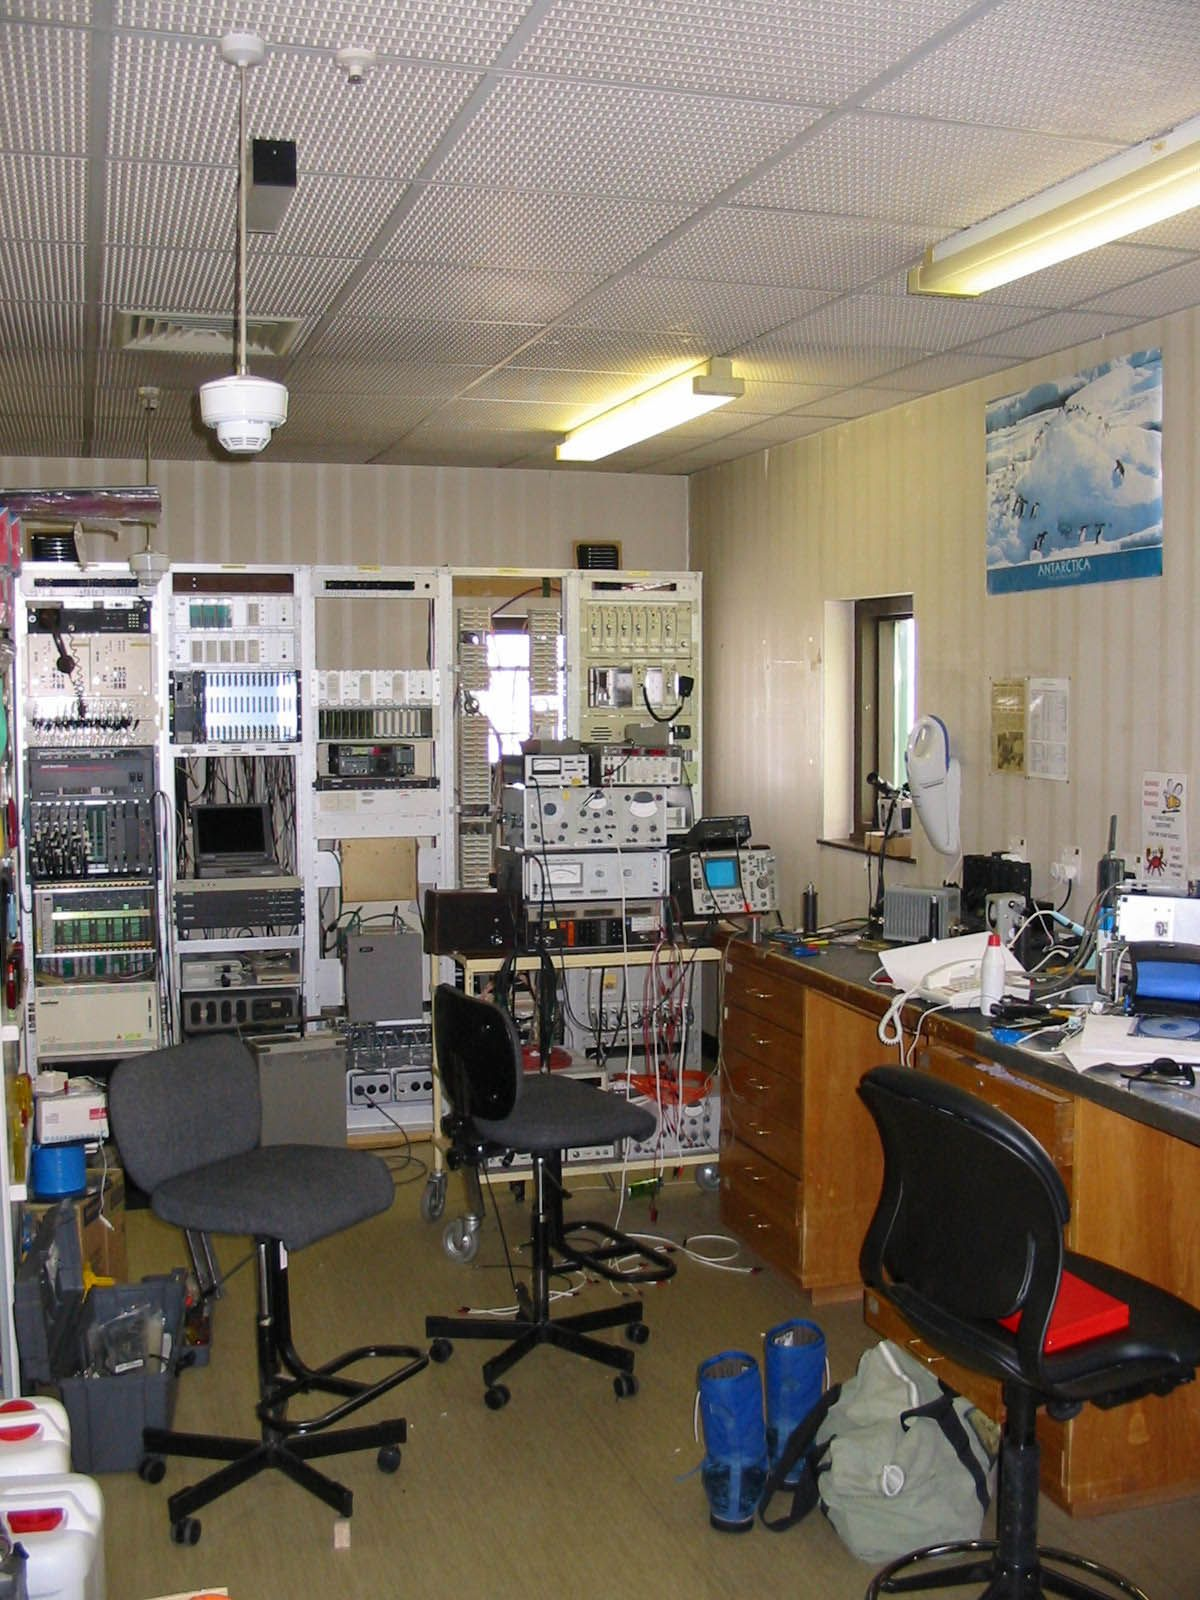 Laboratory Room Design: 1000+ Images About Ham Shack Design Ideas On Pinterest